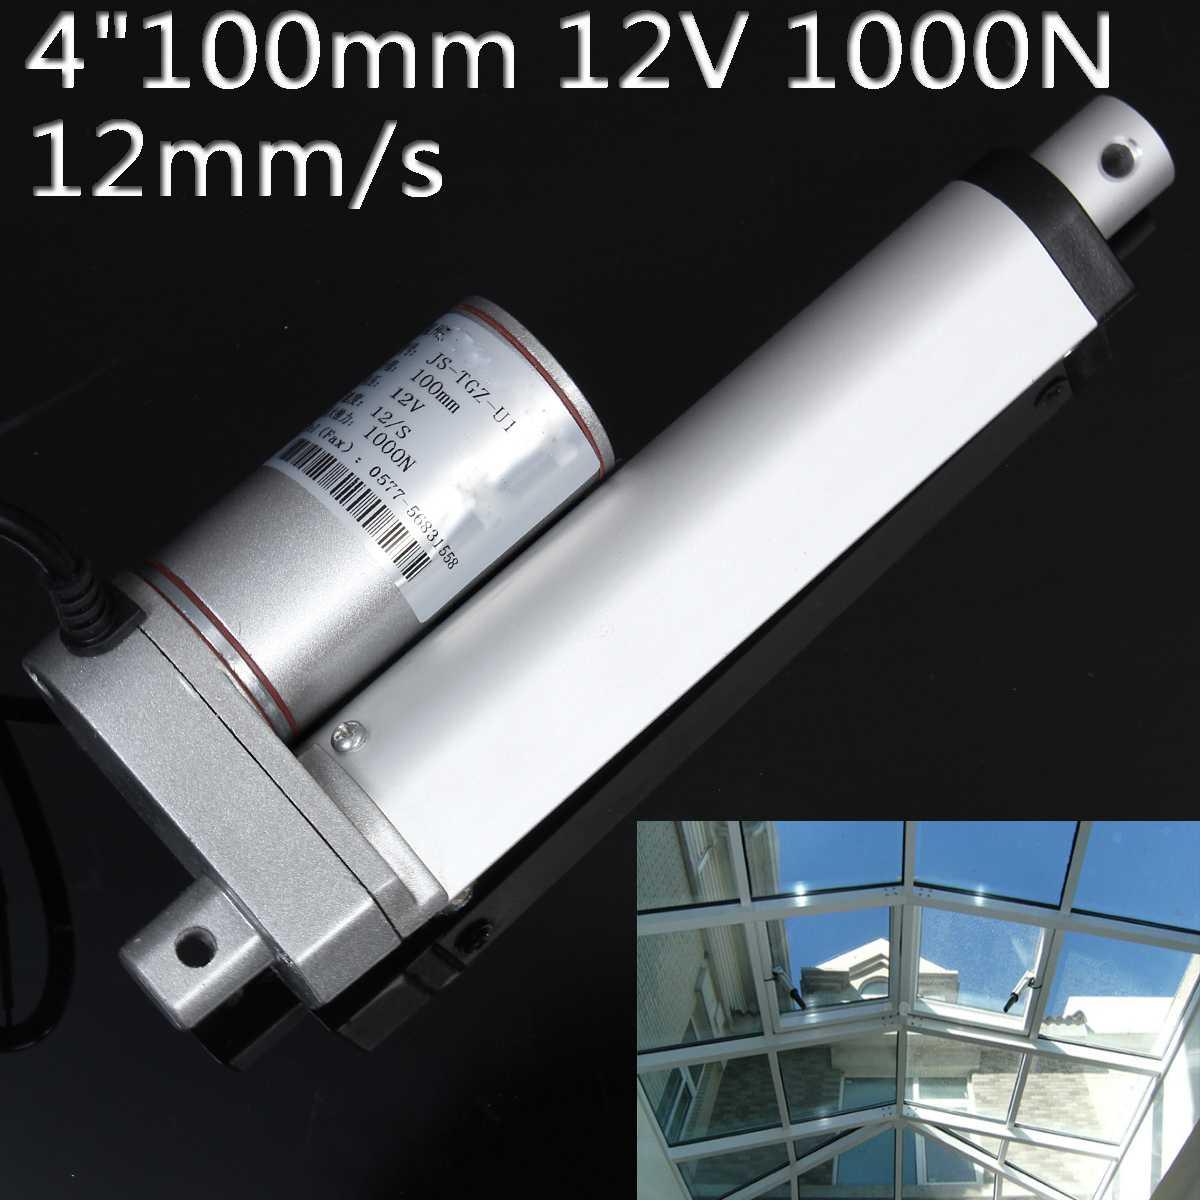 Electric Linear Actuator DC 12V 1000N 50 500mm Stroke Linear Motor Controller 2/4/6/8/16/20 Heavy Electric Bracket